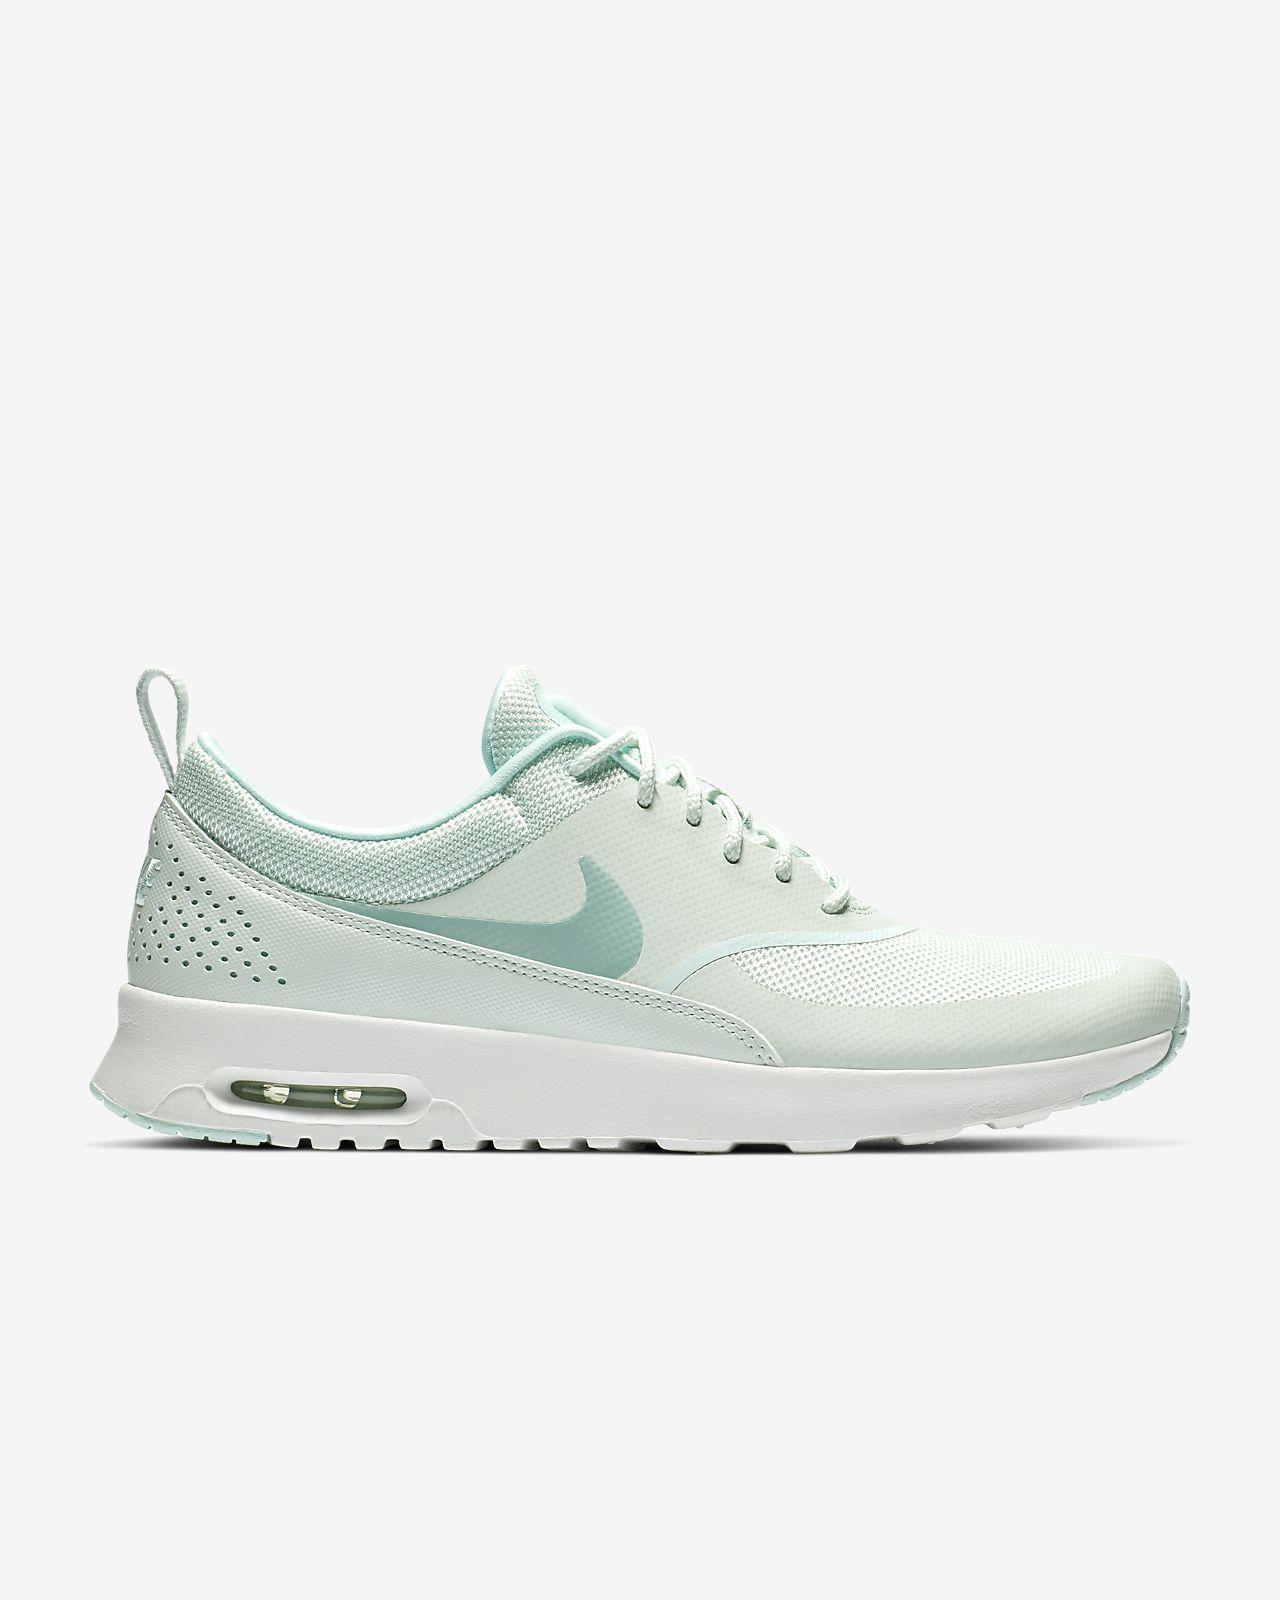 41a5ba100151 Nike Air Max Thea - sko til kvinder. Nike.com DK